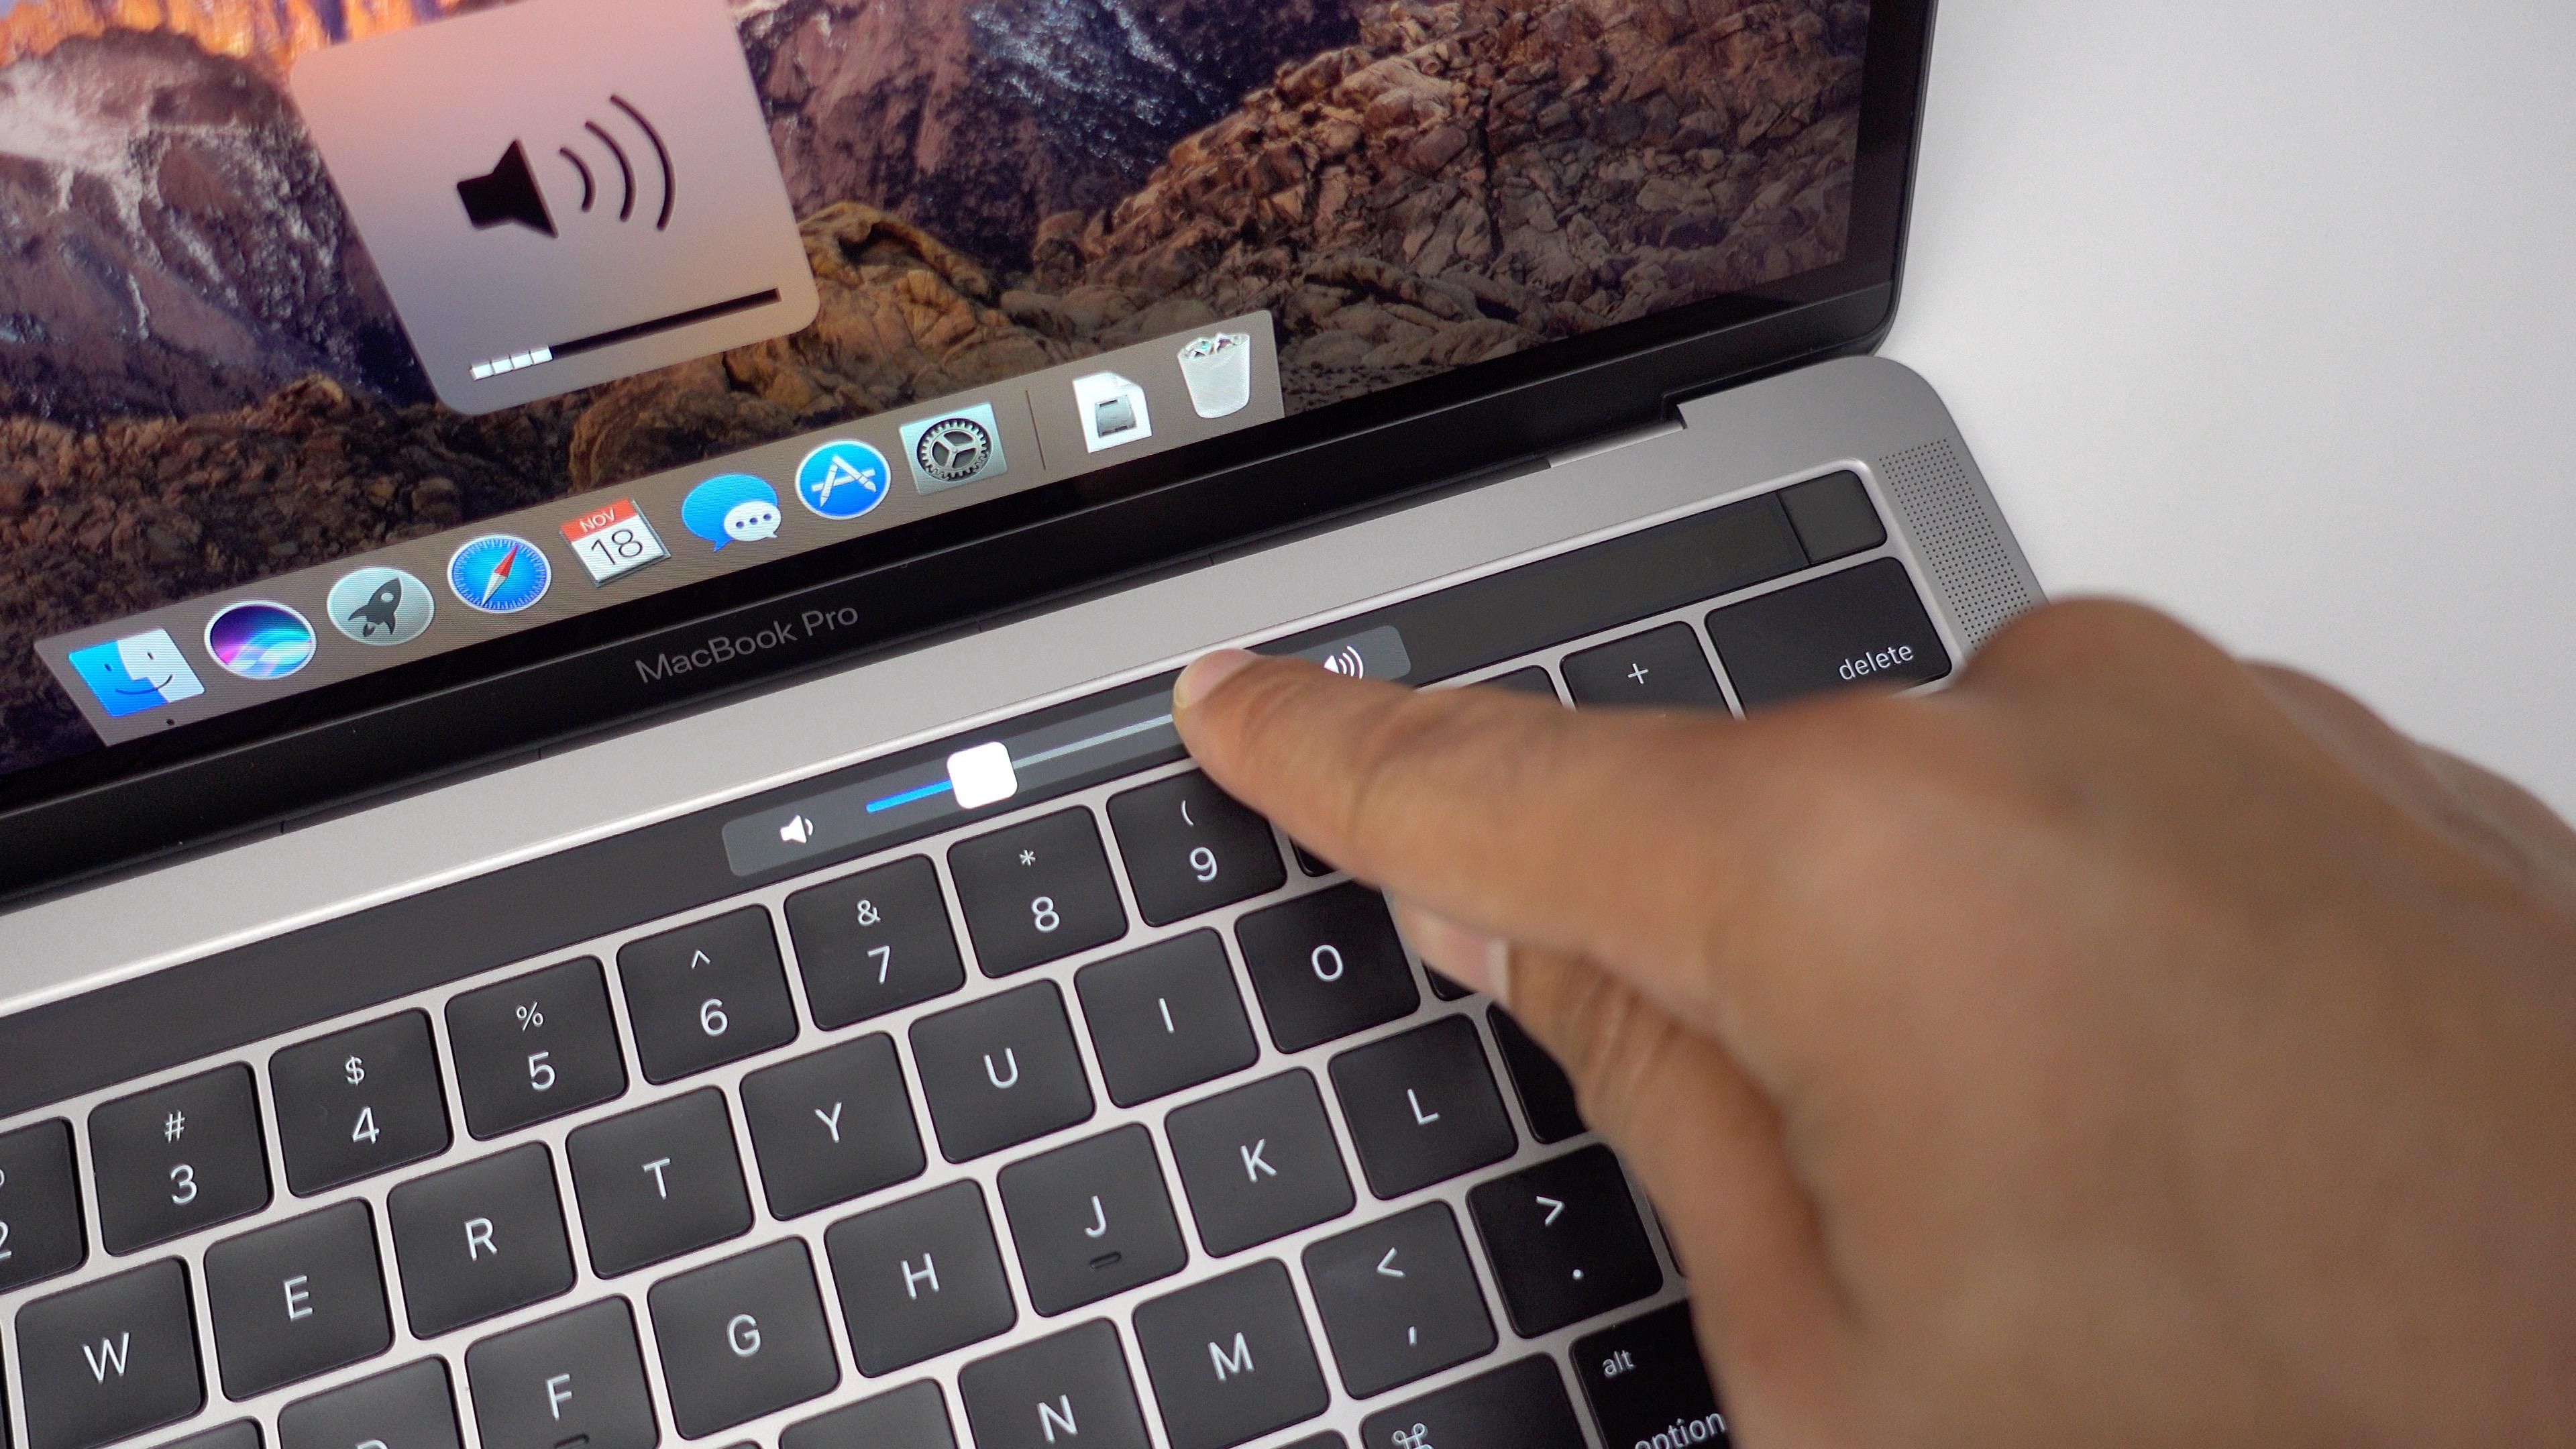 Macbook pro bar pet